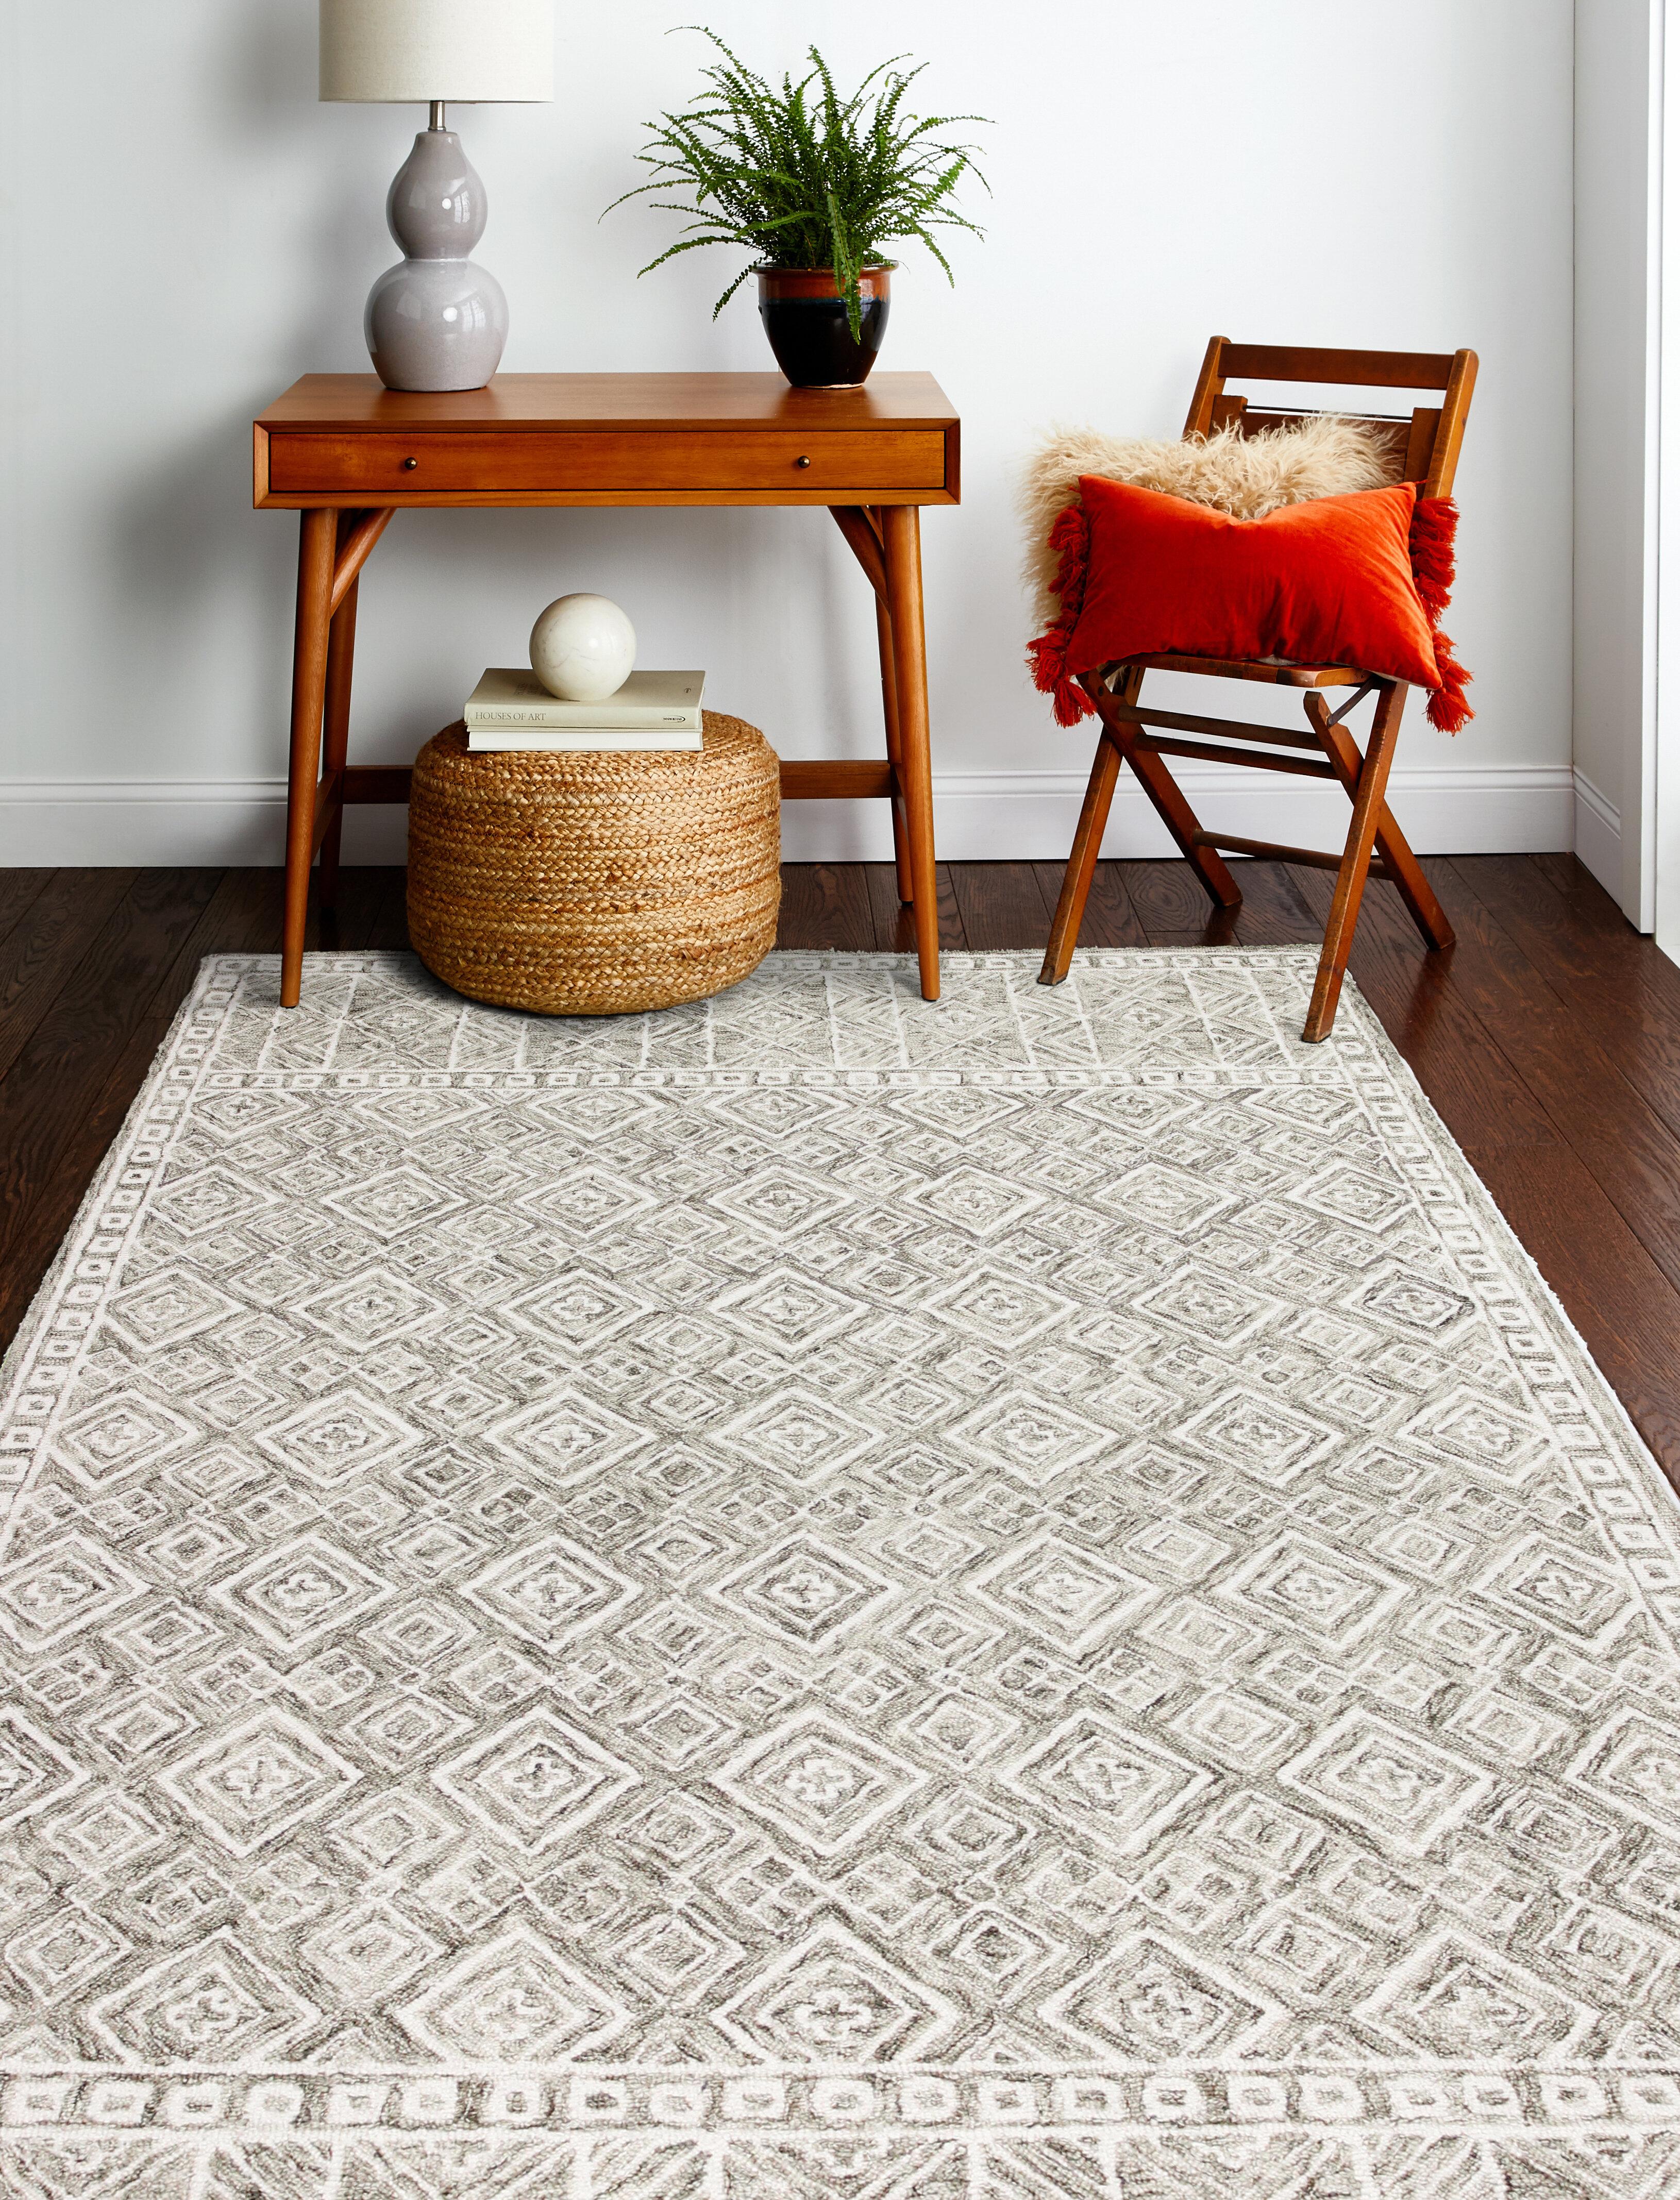 Lafontaine Geometric Handmade Tufted Wool Taupe Area Rug Reviews Birch Lane